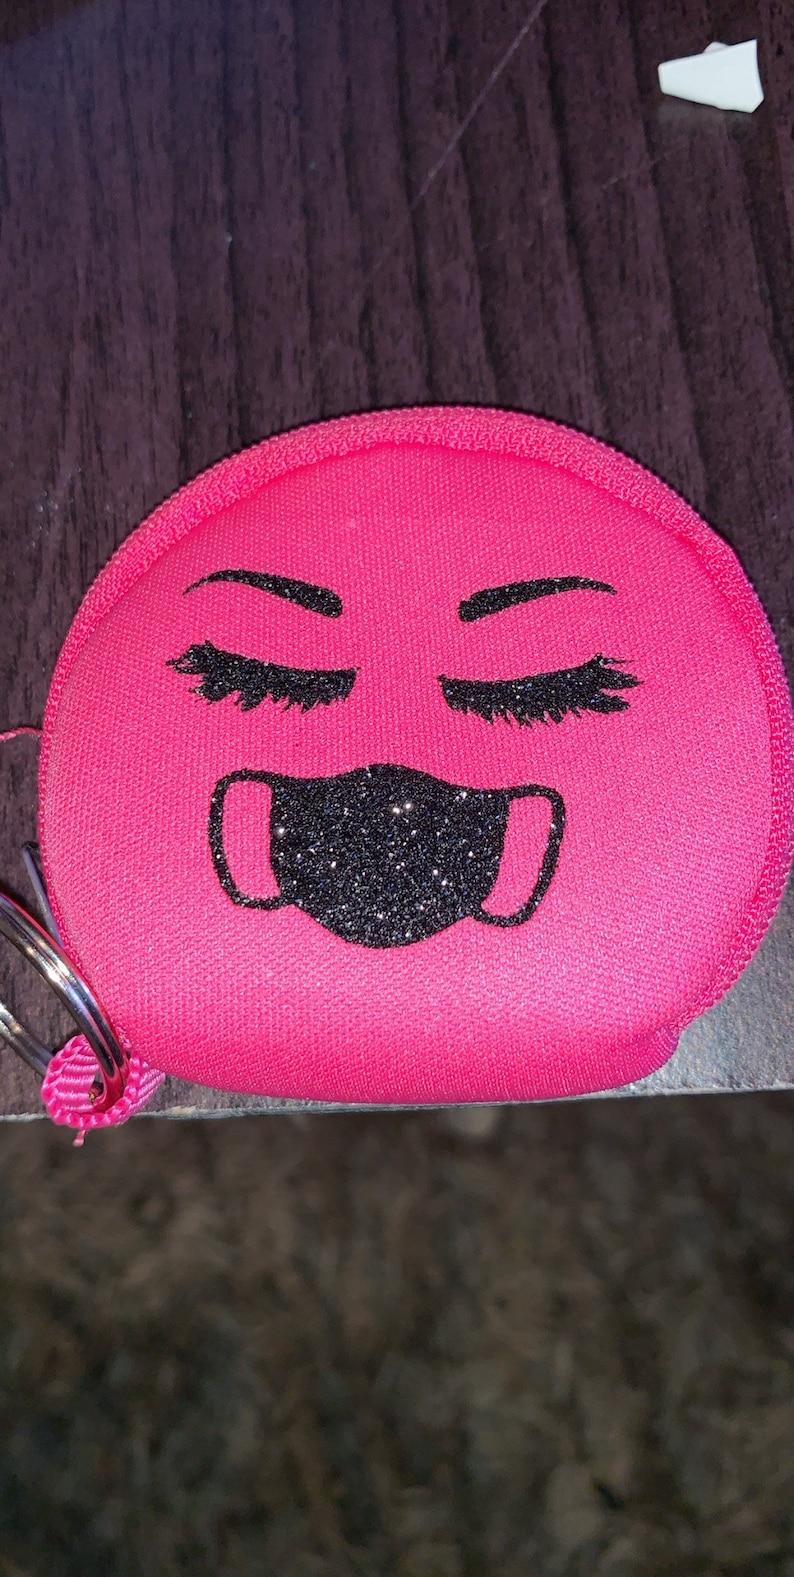 Mask holder keychains